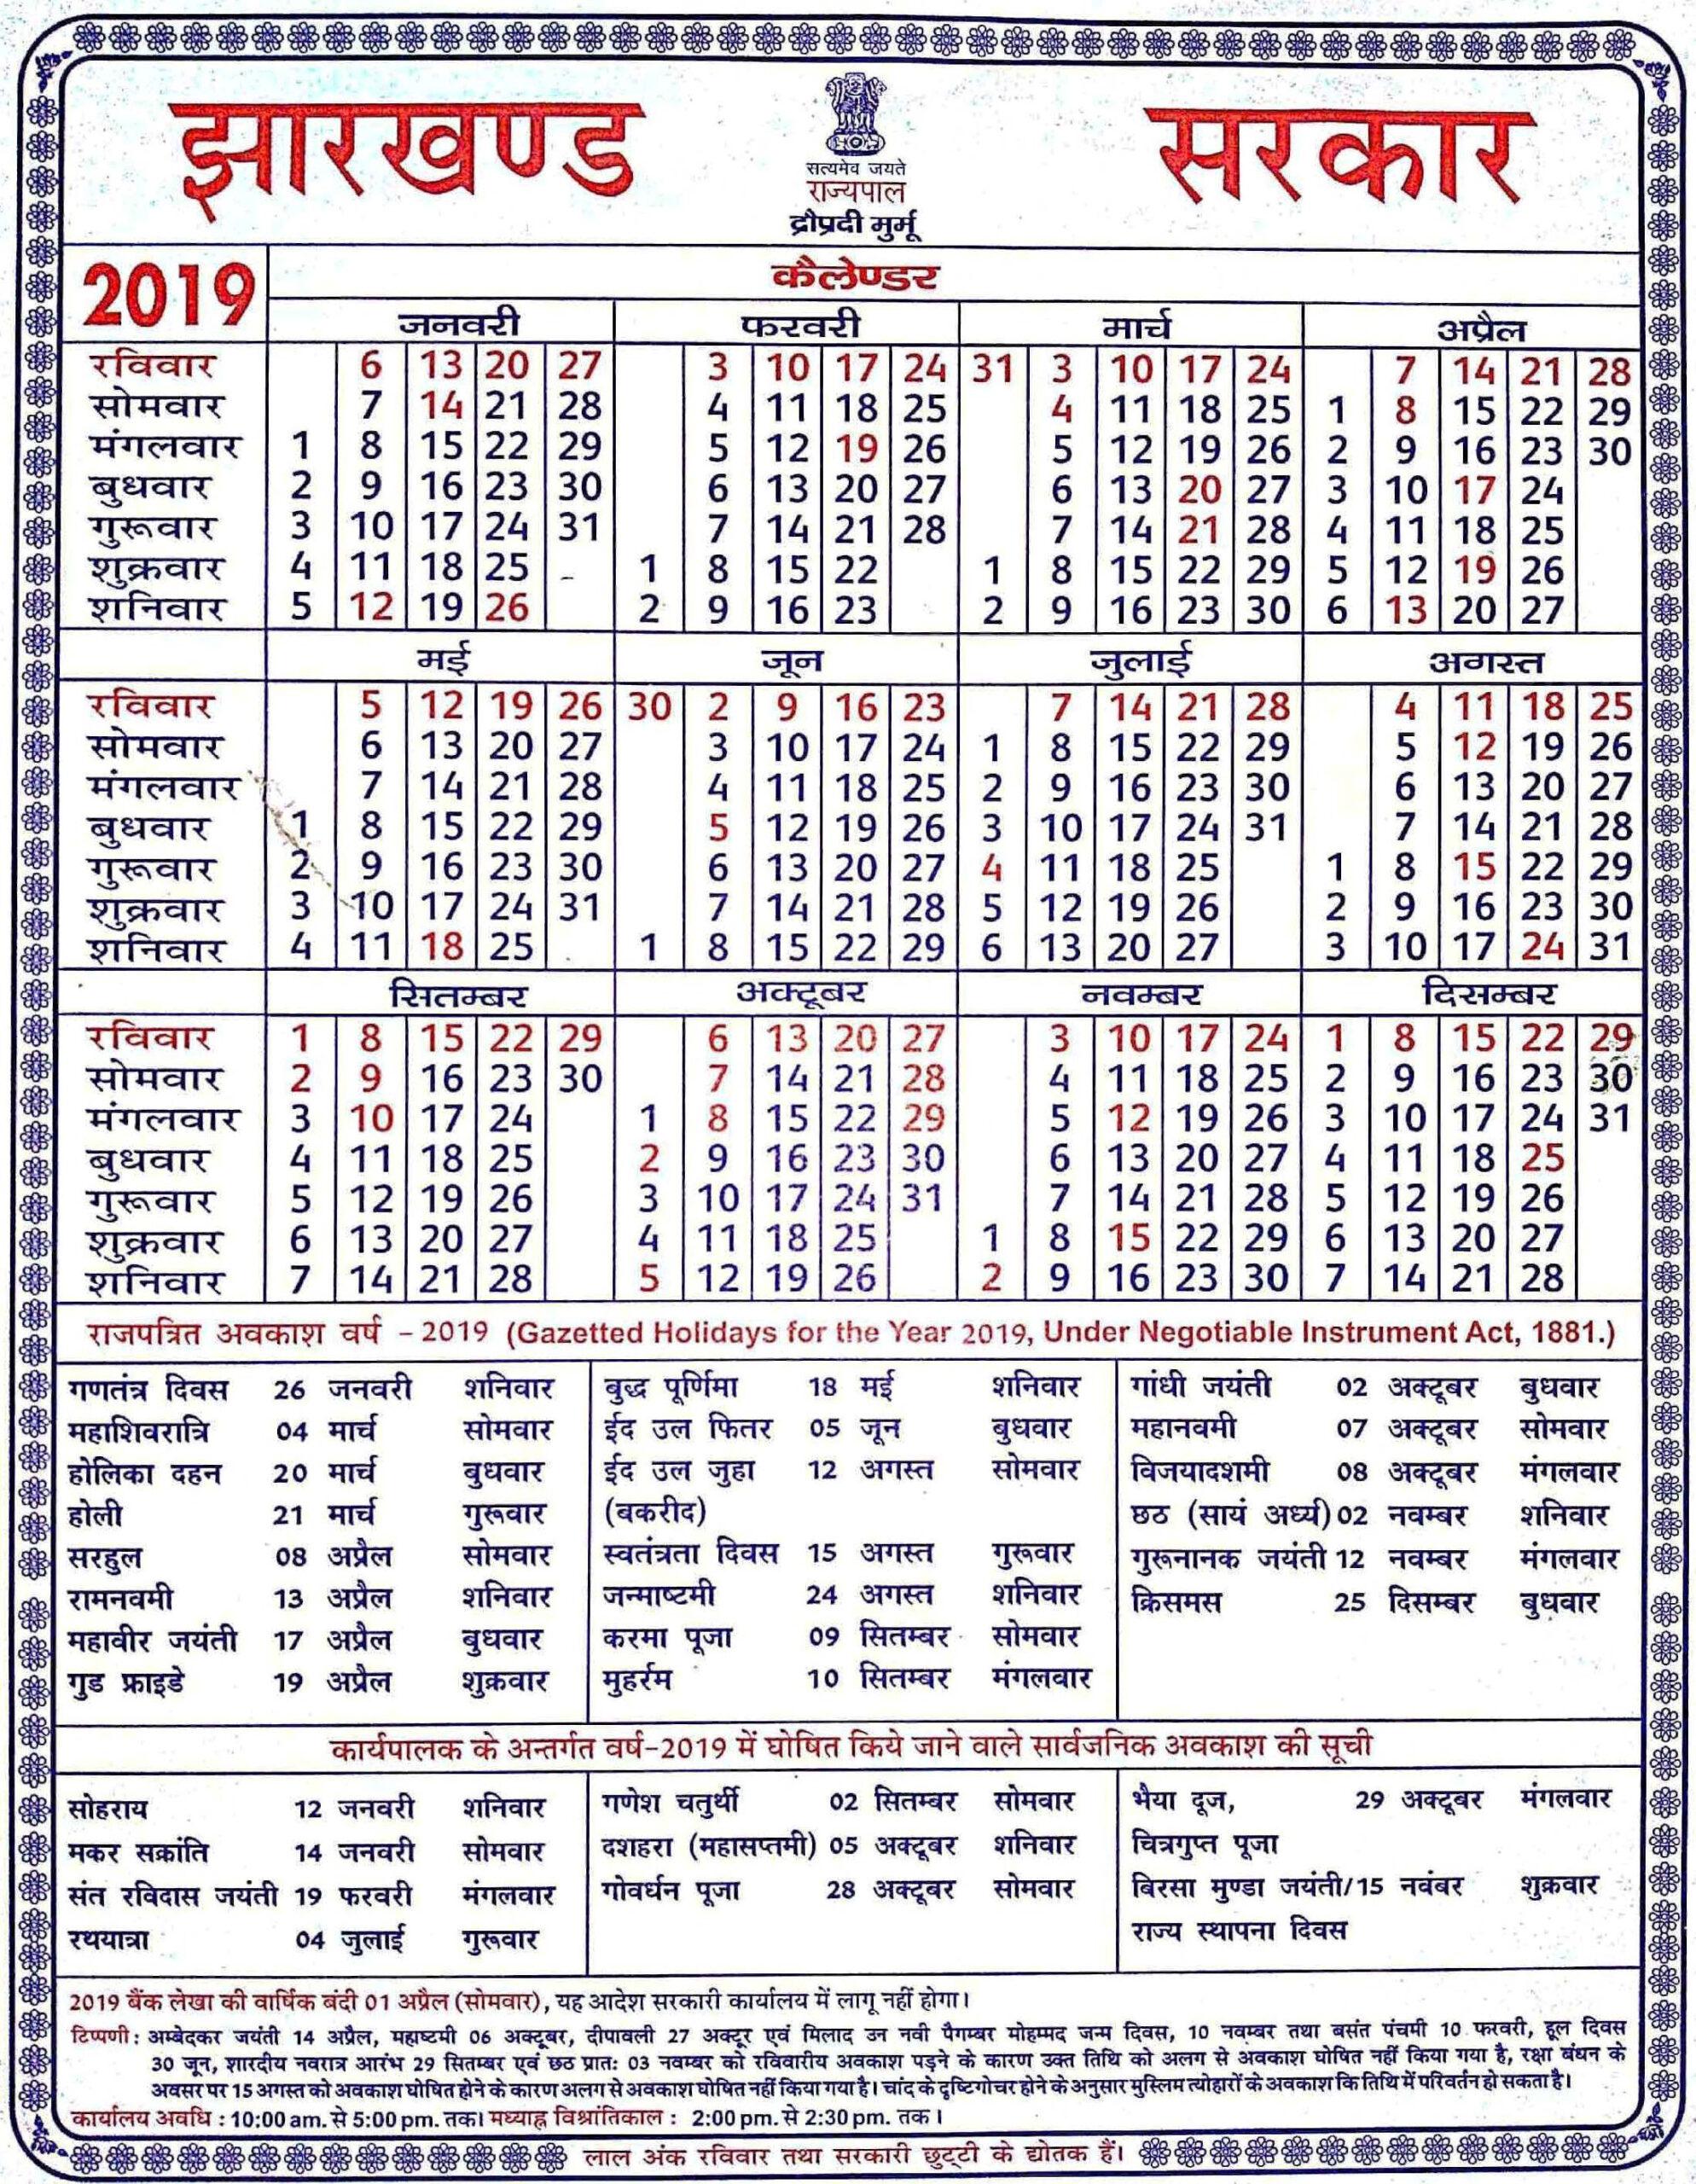 Bihar Sarkar Calender 2020 | Calendar For Planning with Bihar Sarkar Holiday Calendar